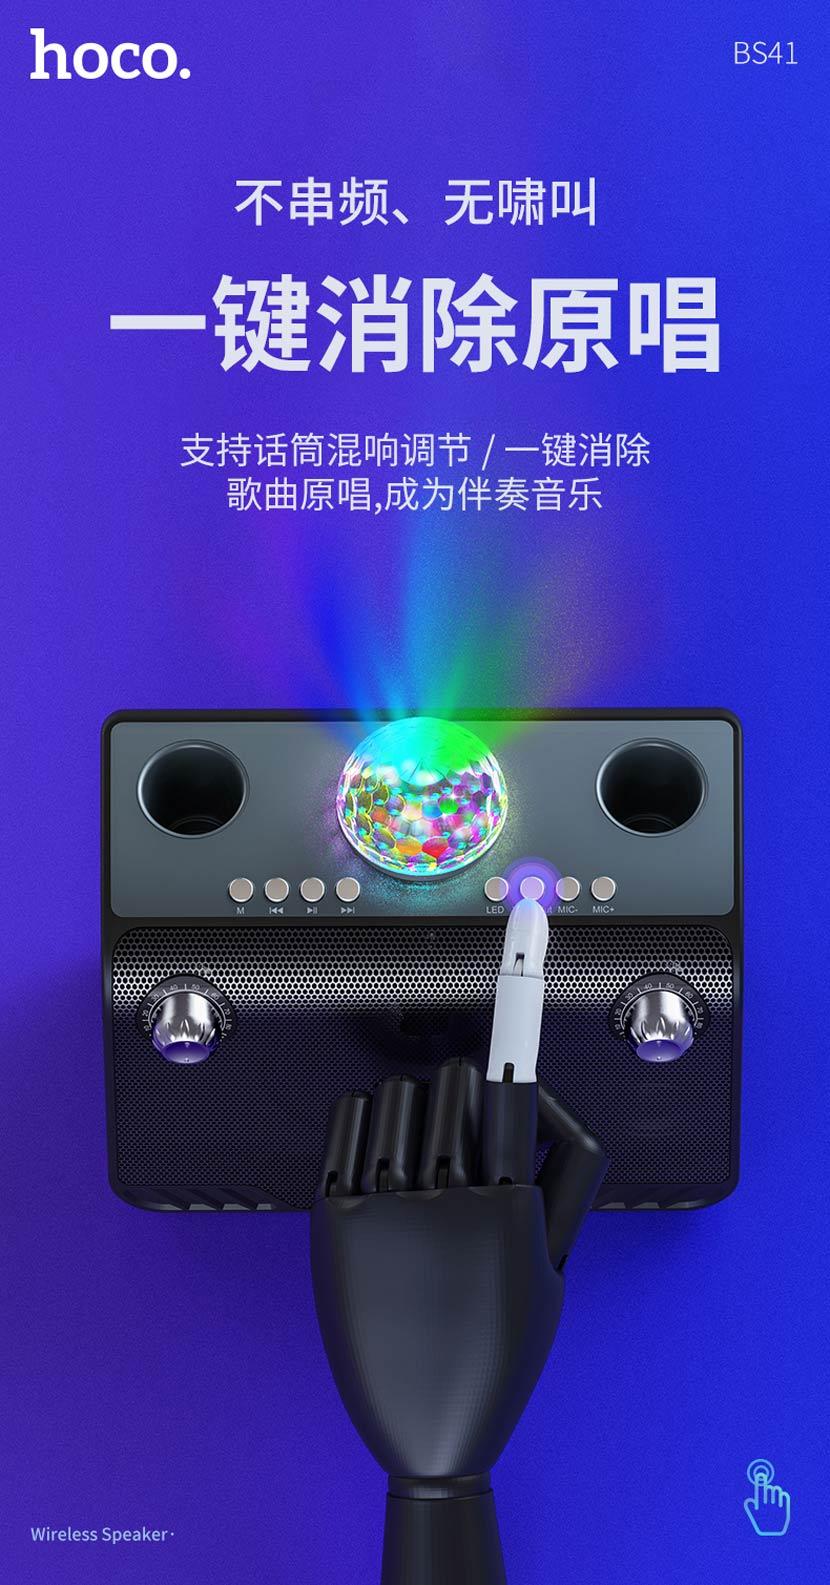 hoco news bs41 warm sound k song wireless speaker accompaniment cn